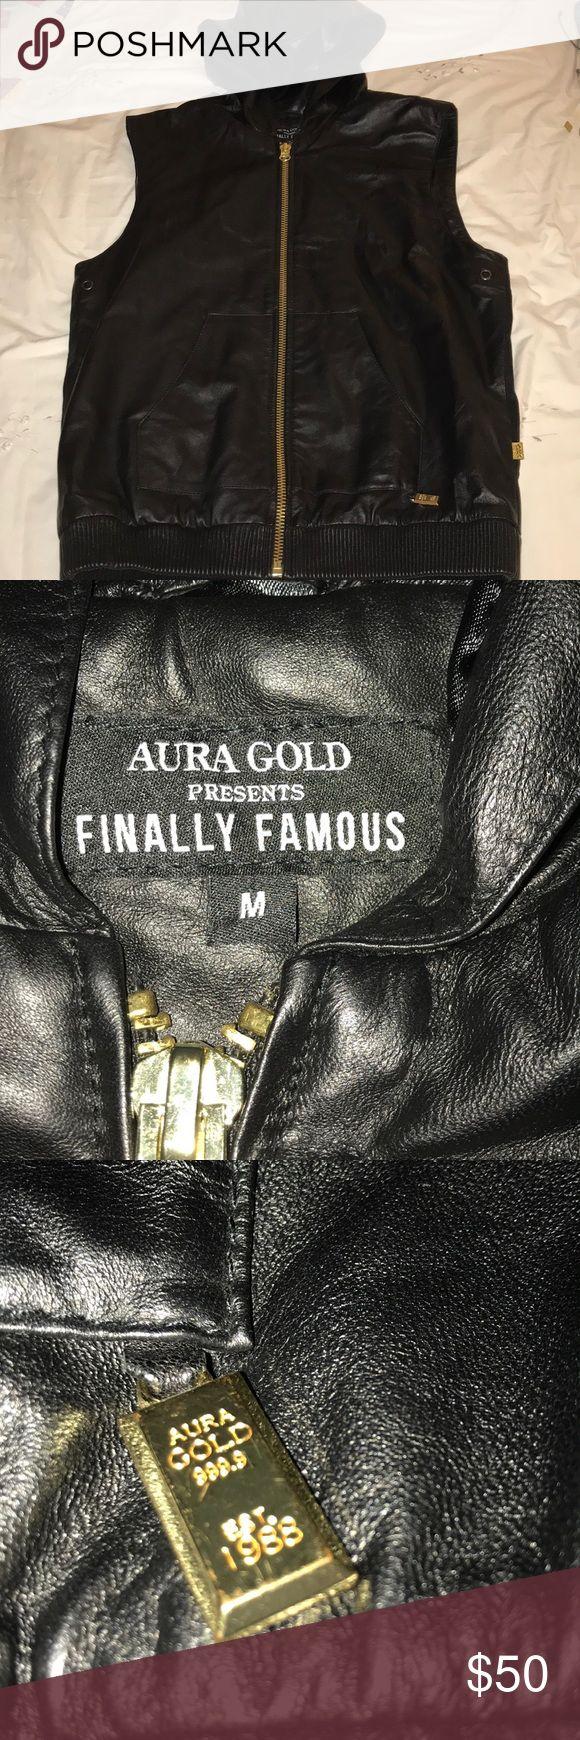 Big Sean Aura Gold Finally Famous Vest Black pvc vest with gold accents. Aura Gold Jackets & Coats Vests